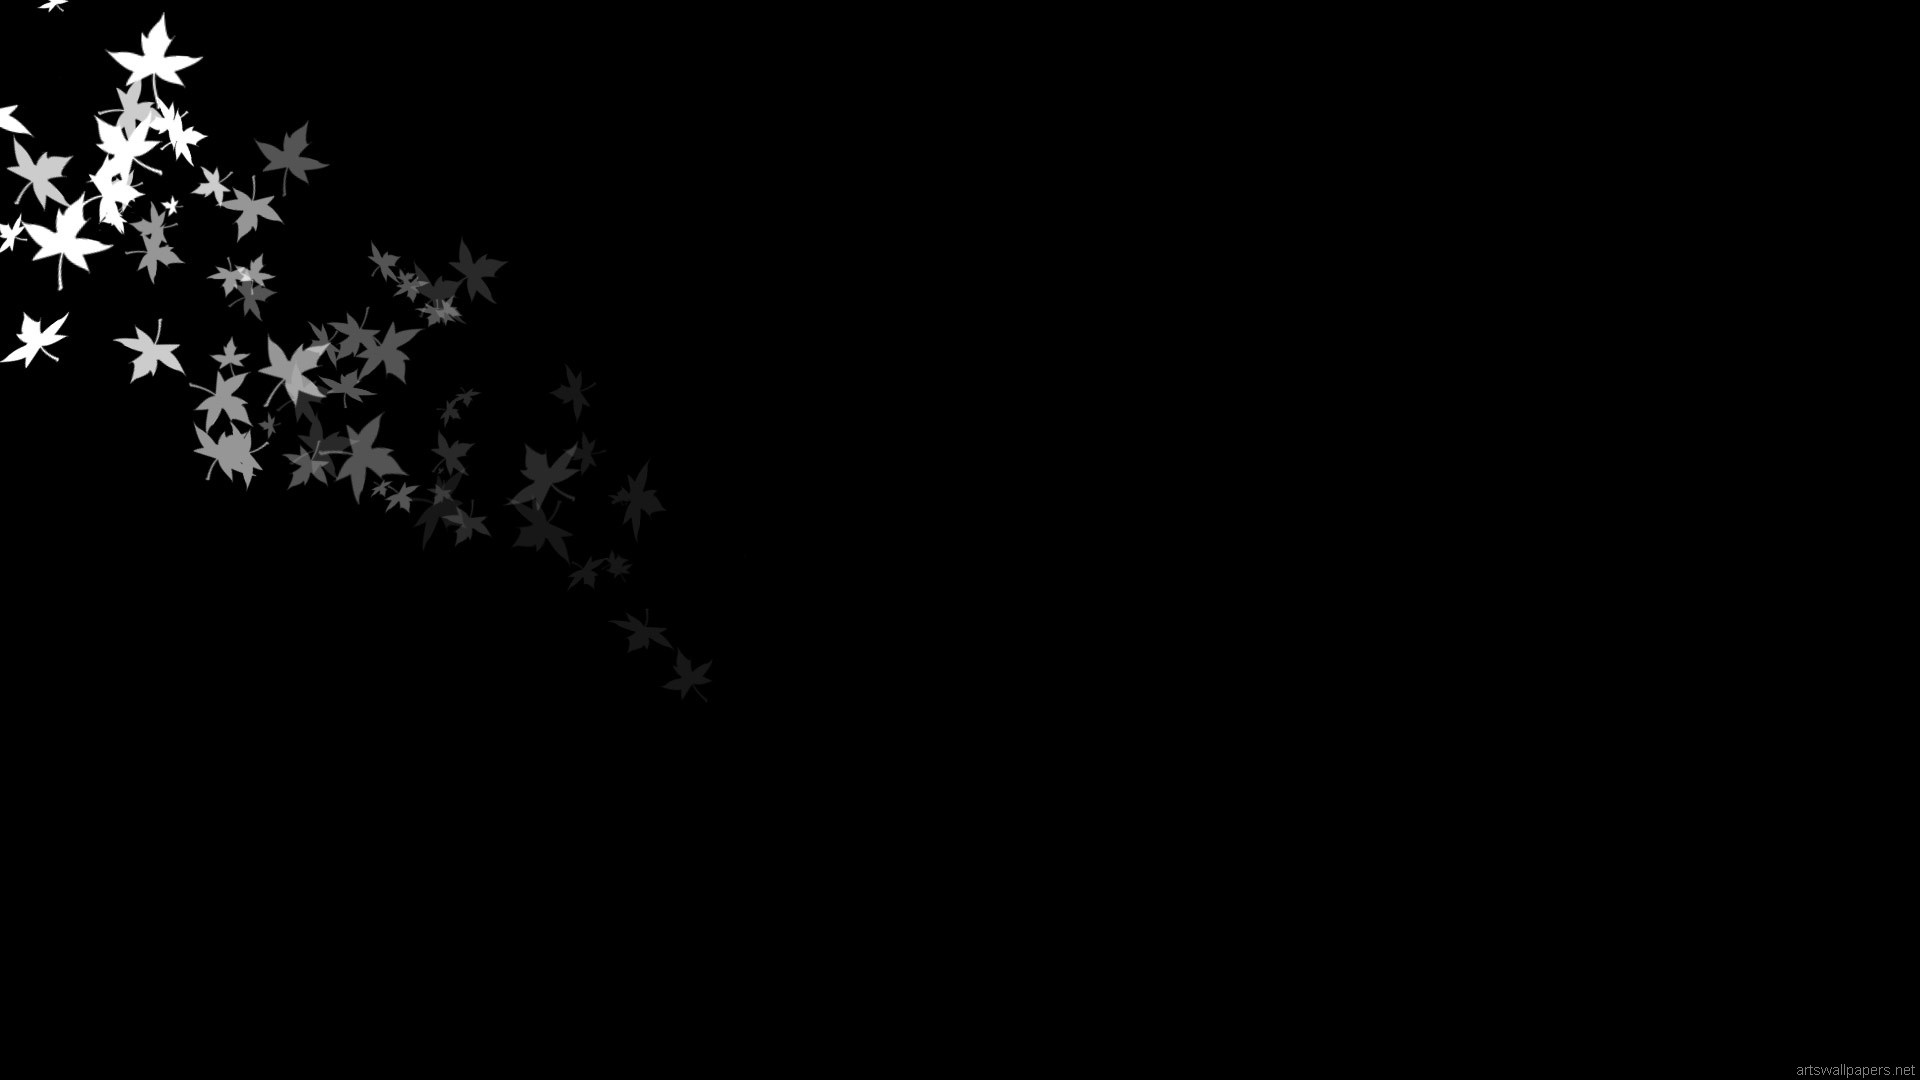 Dark Wallpapers, Full HD, Dark Wallpaper, Desktop Wallpaper